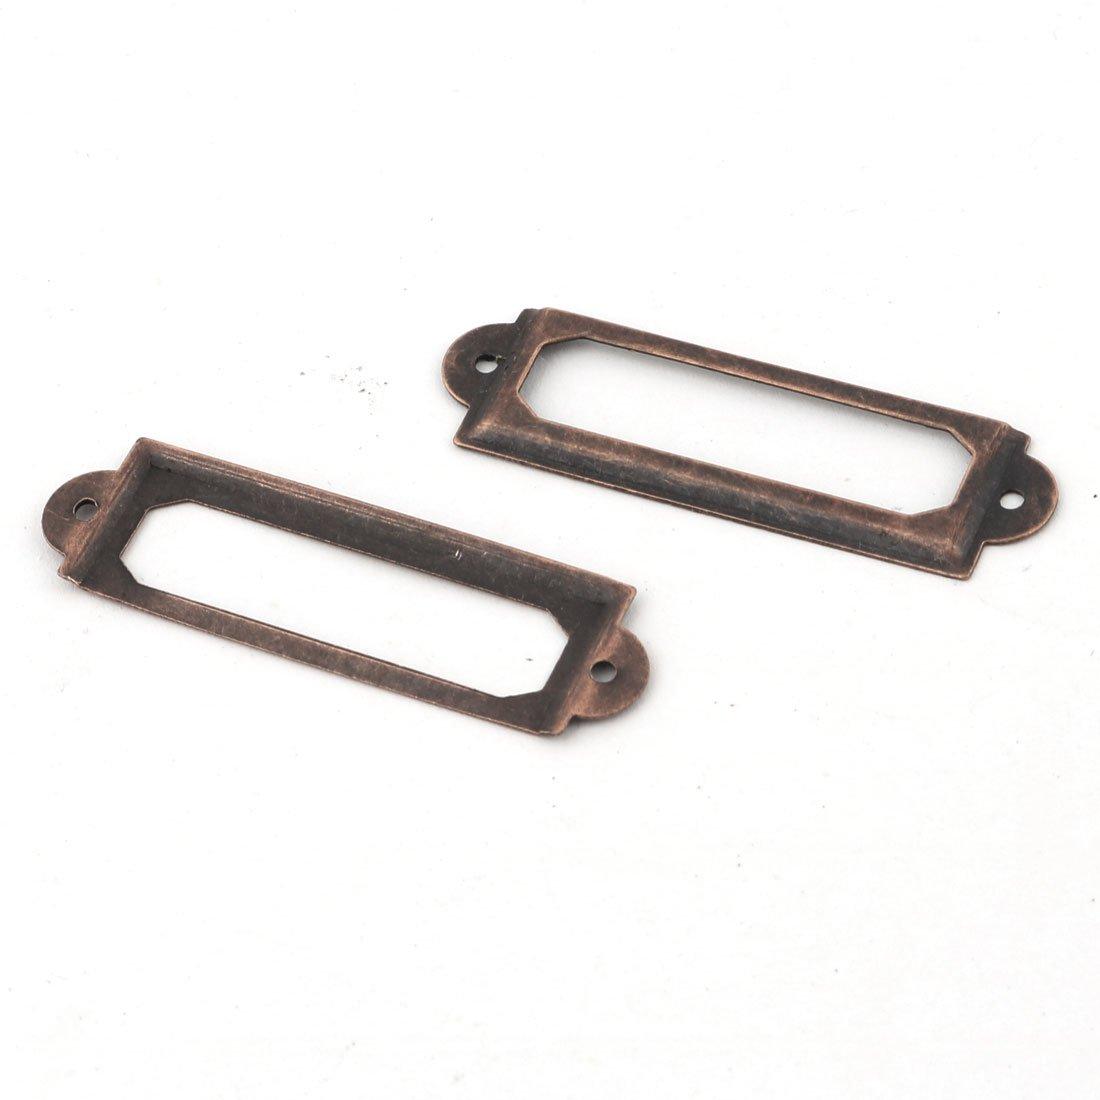 sourcingmap/® Metal Frames Shelves Drawers Box Case Cabinet Name Card Tag Label Holder 56 x 17mm 12 Pcs Copper Tone